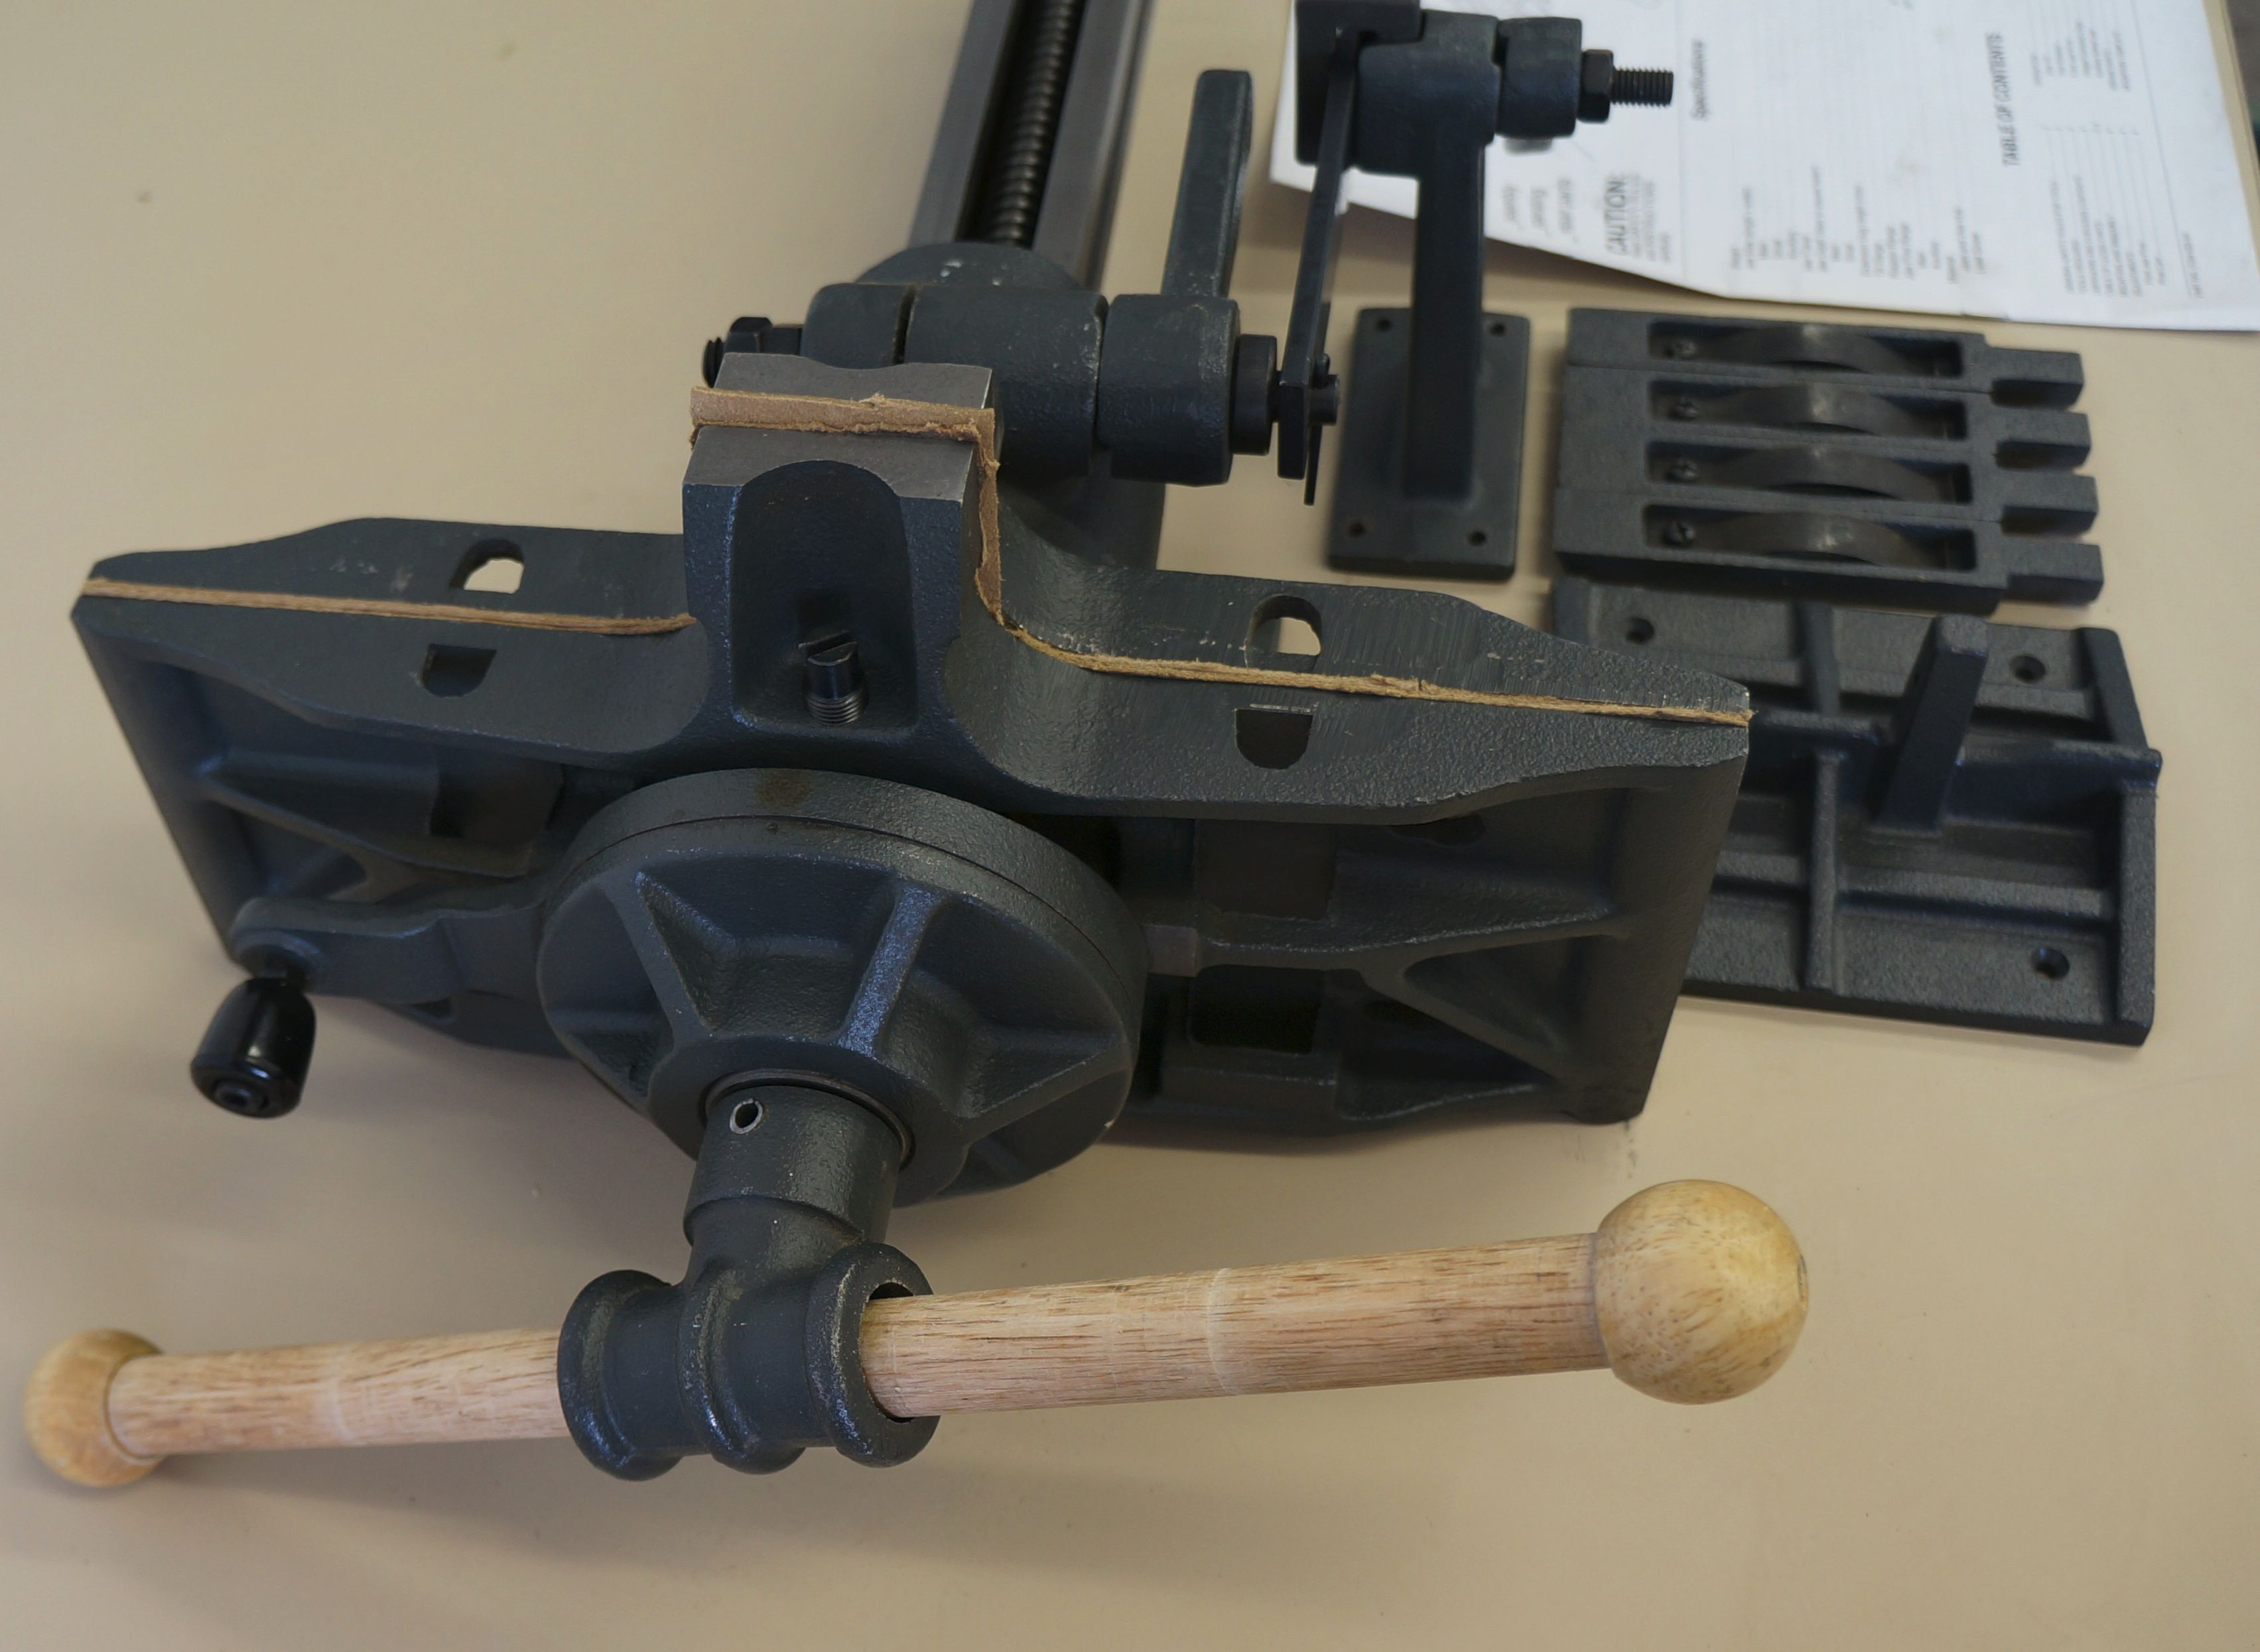 Pattern makers vise. www.nebraskatool.com #vise #woodworking #shop tools Wood crafting tools